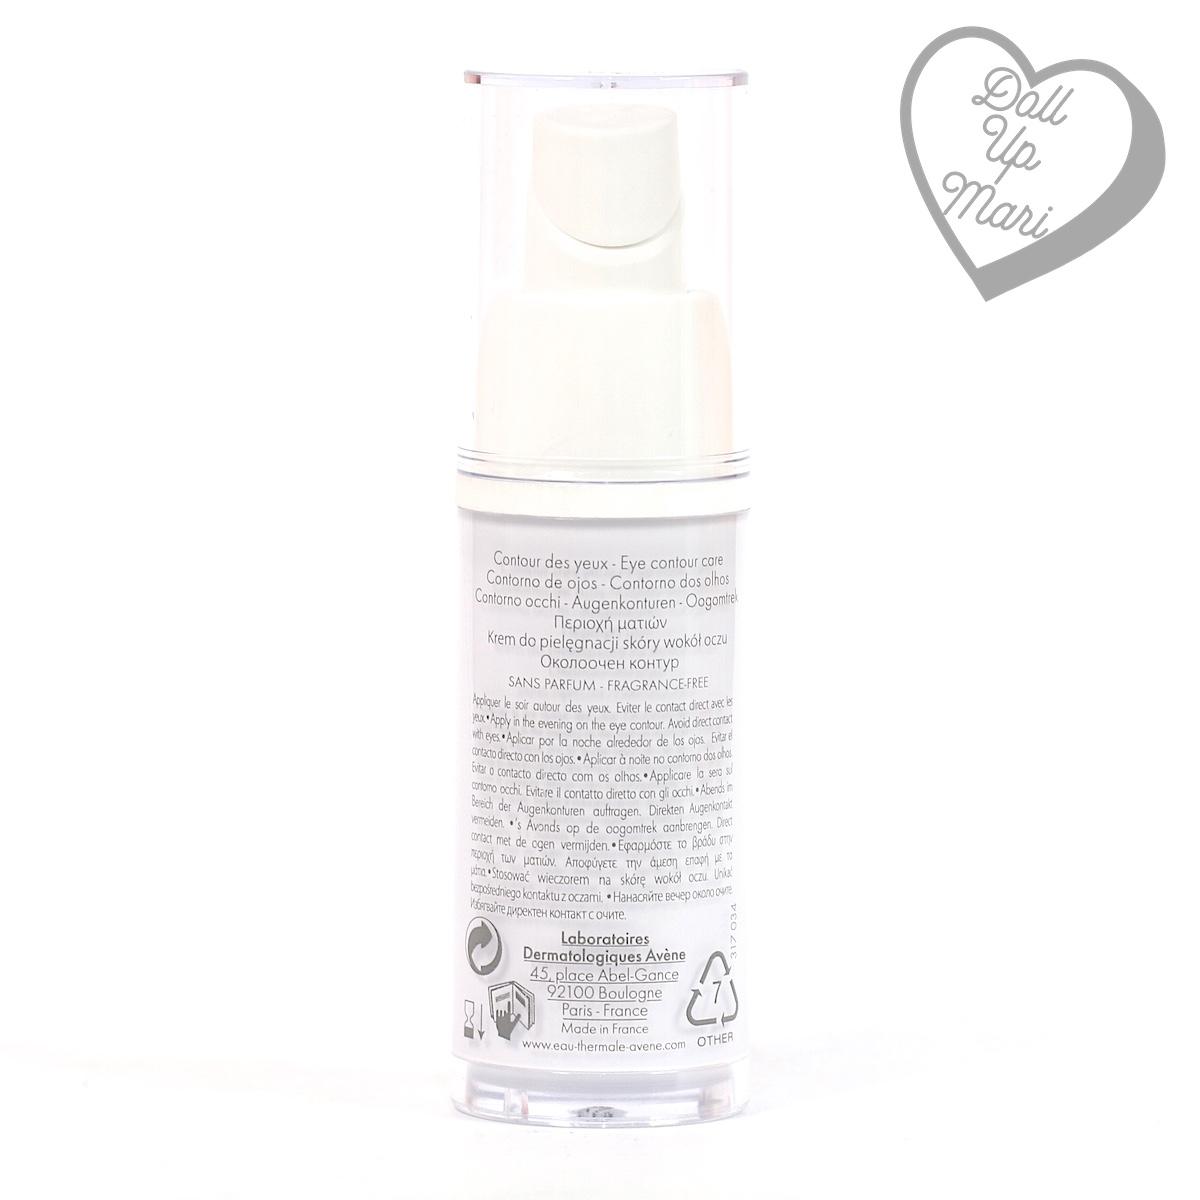 bottle rear of Avène PhysioLift Eye Contour Cream